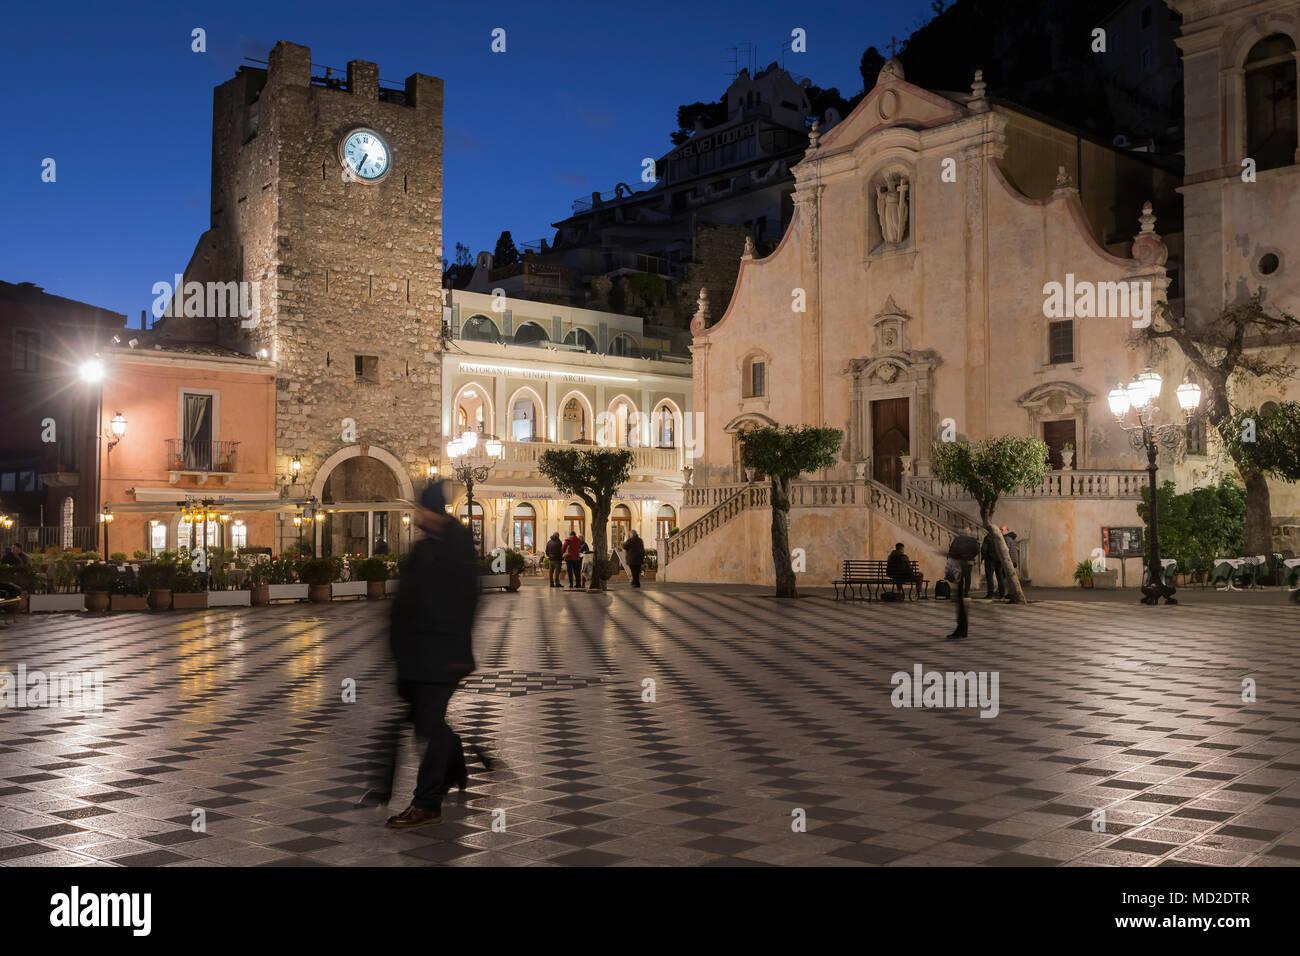 Piazza IX Aprile Square, San Giuseppe Kirche und Glockenturm in Taormina, Sizilien. Stockbild